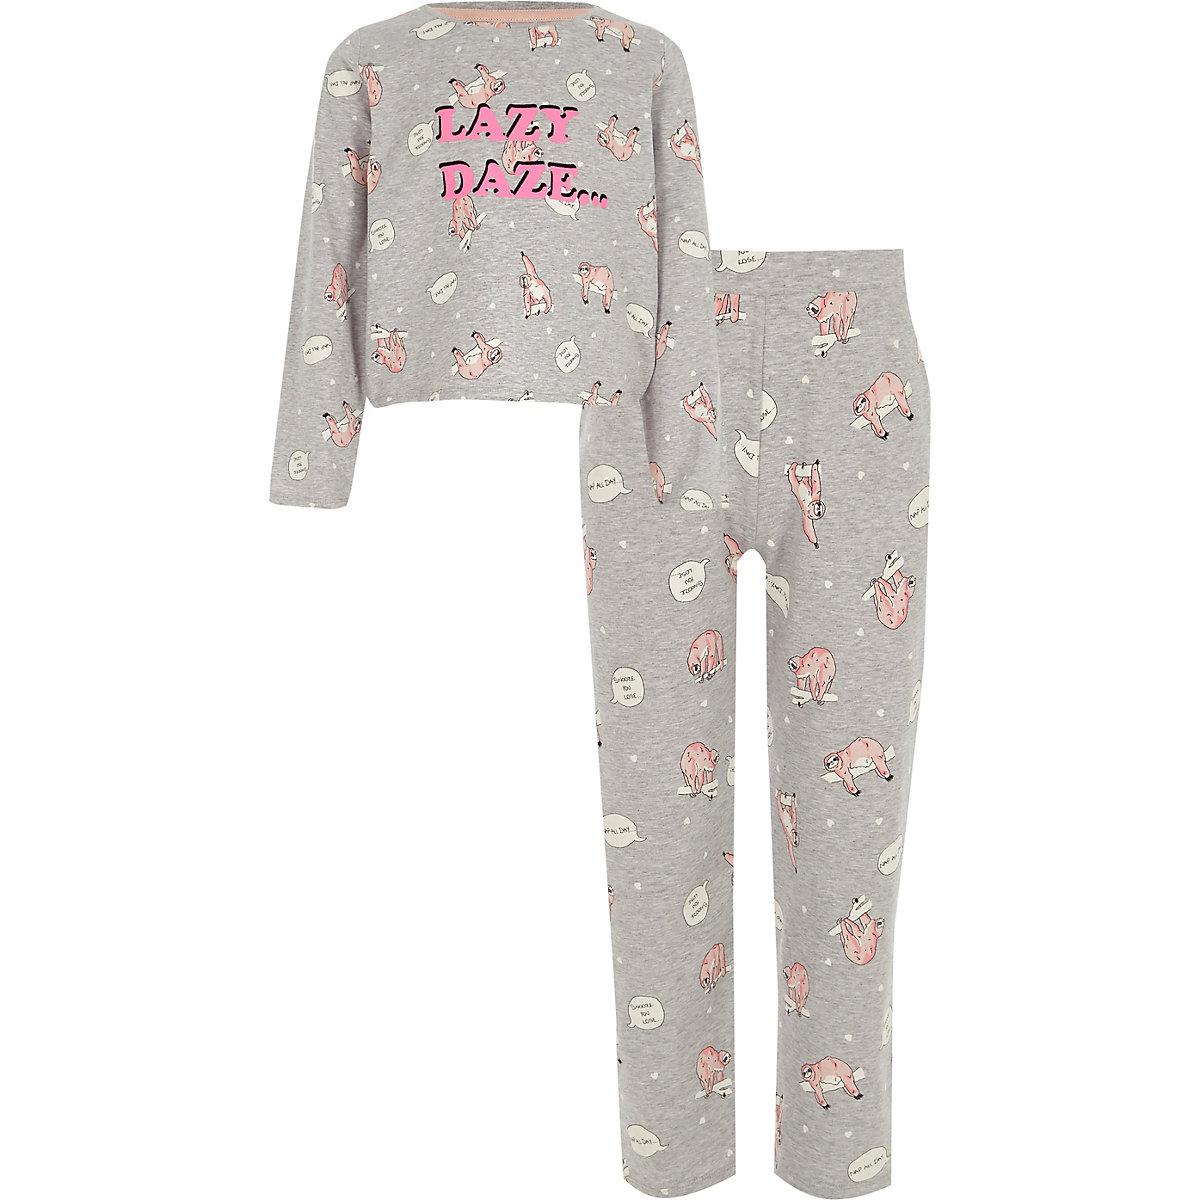 Girls grey 'lazy' sloth print pajama set